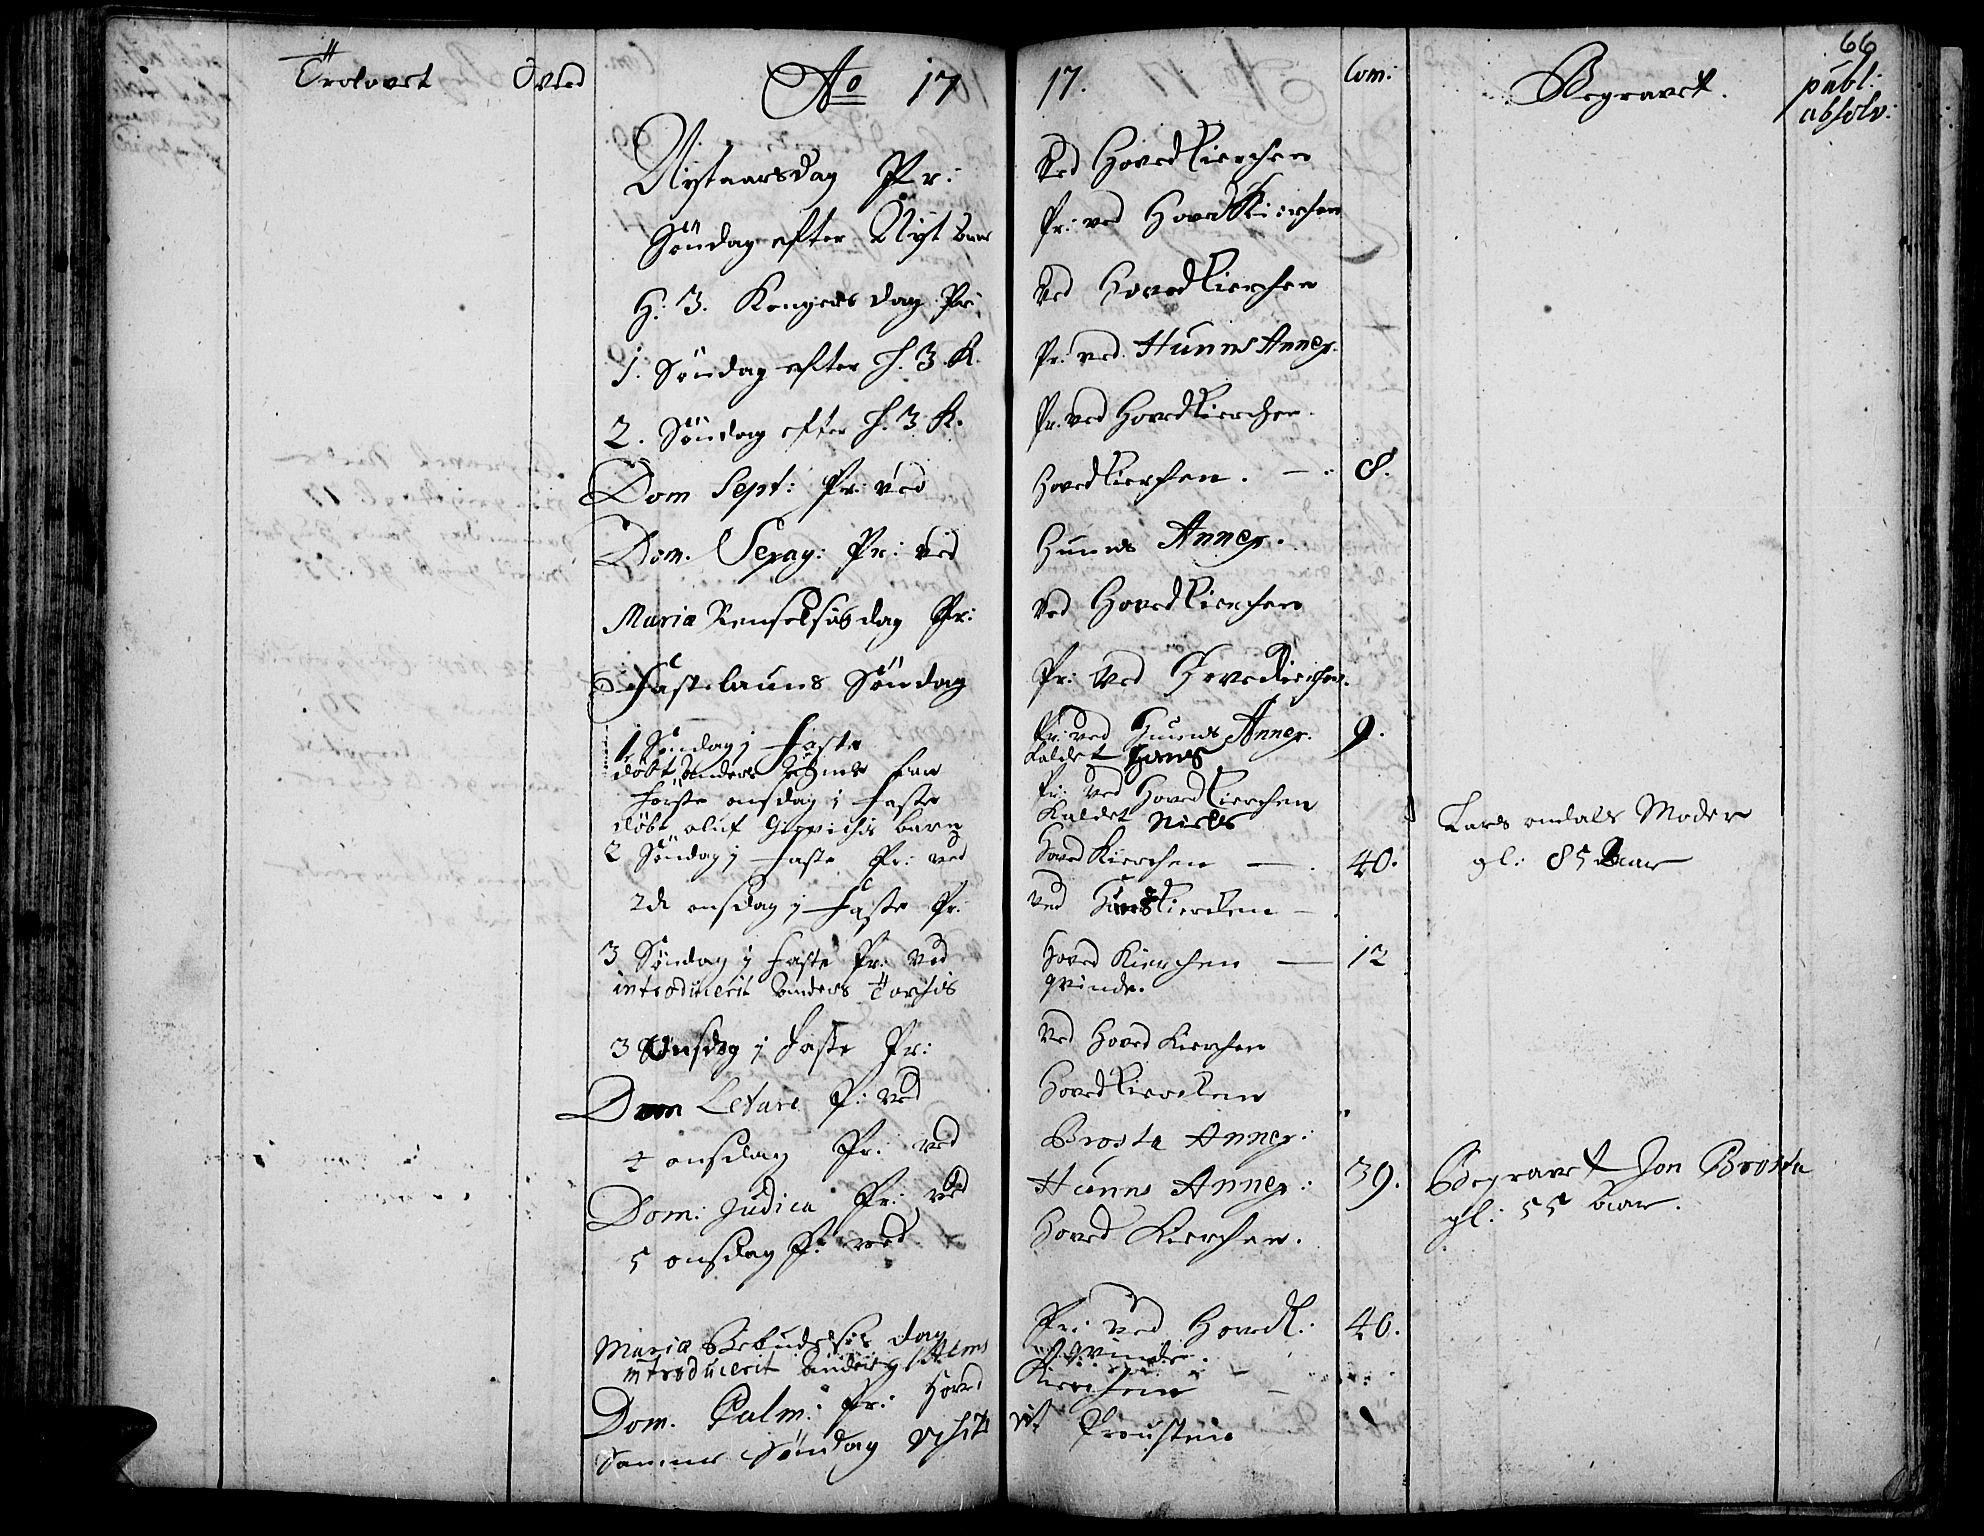 SAH, Vardal prestekontor, H/Ha/Haa/L0001: Ministerialbok nr. 1, 1706-1748, s. 66